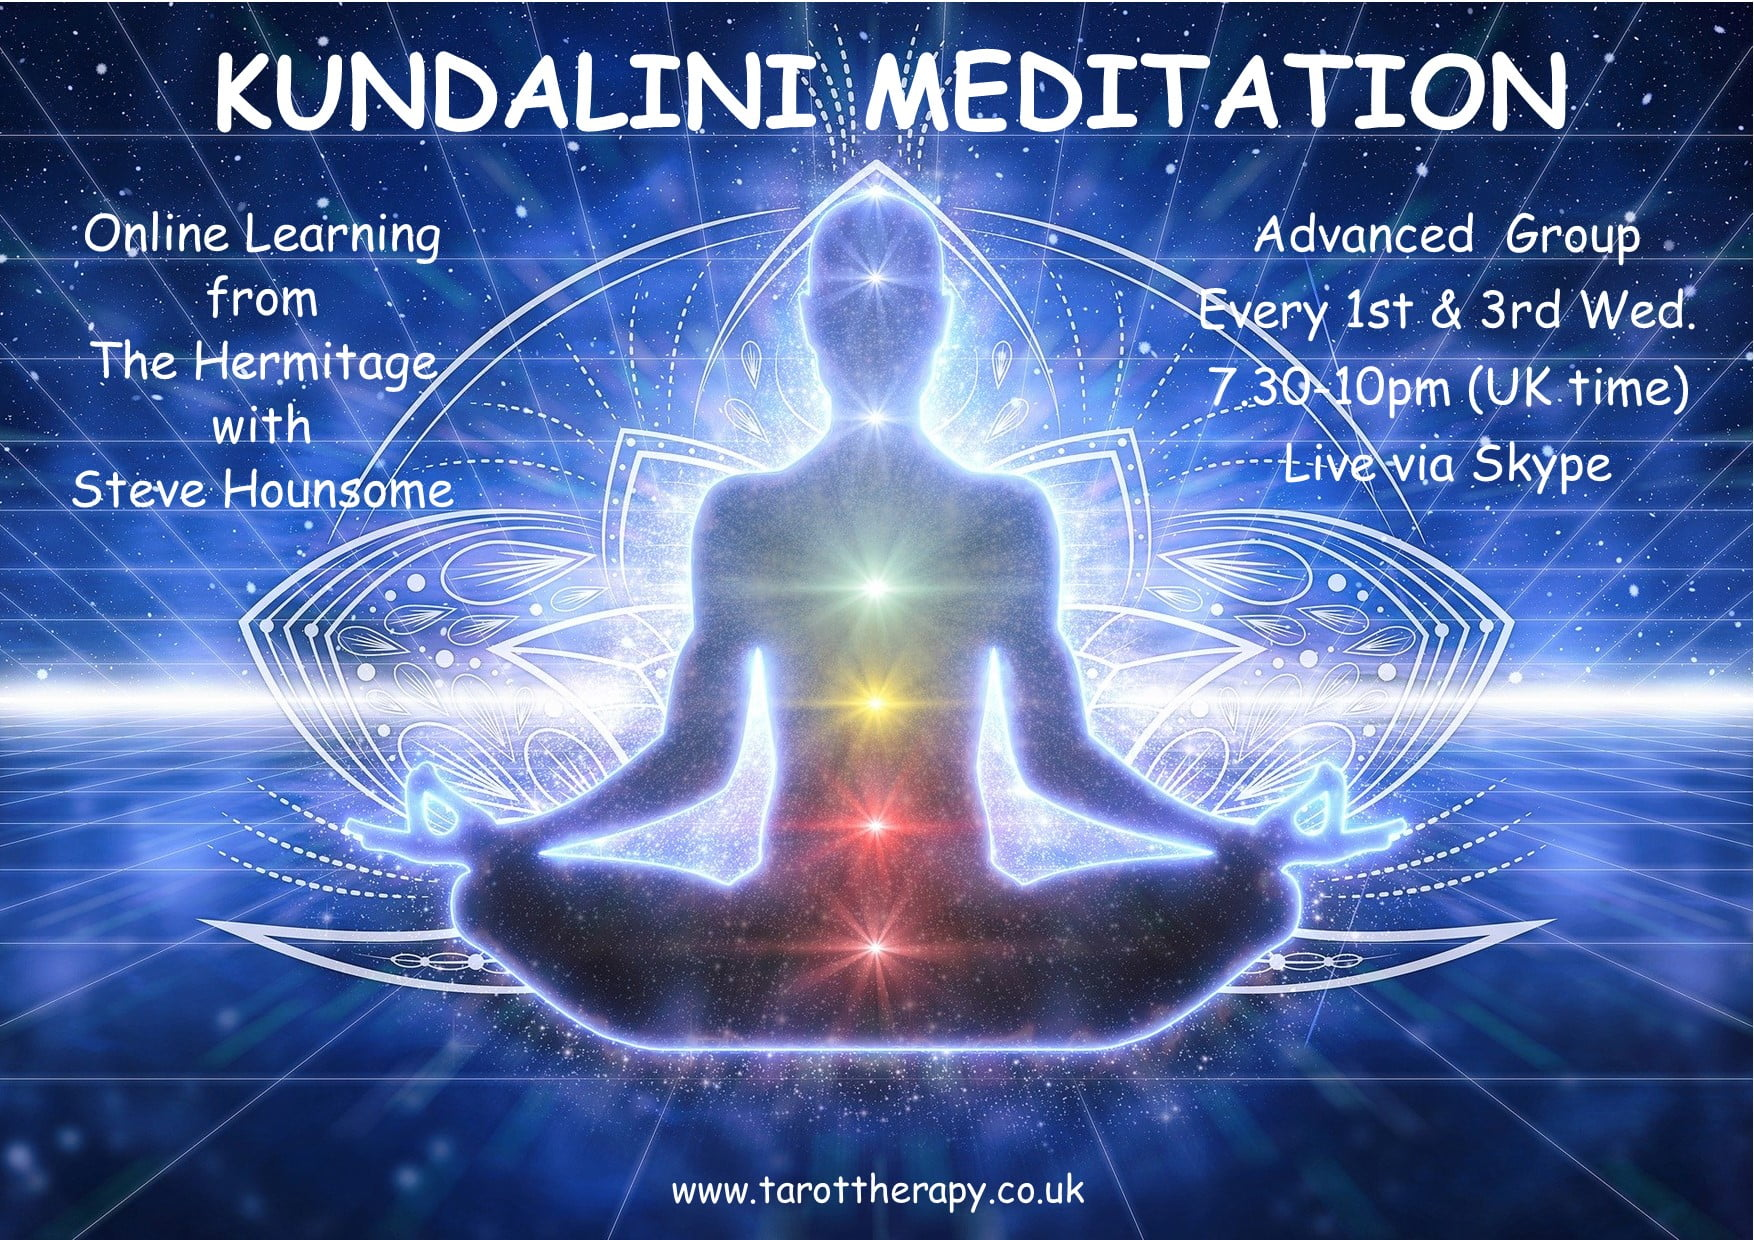 Online Kundalini Meditation - Advanced Group with Steve Hounsome